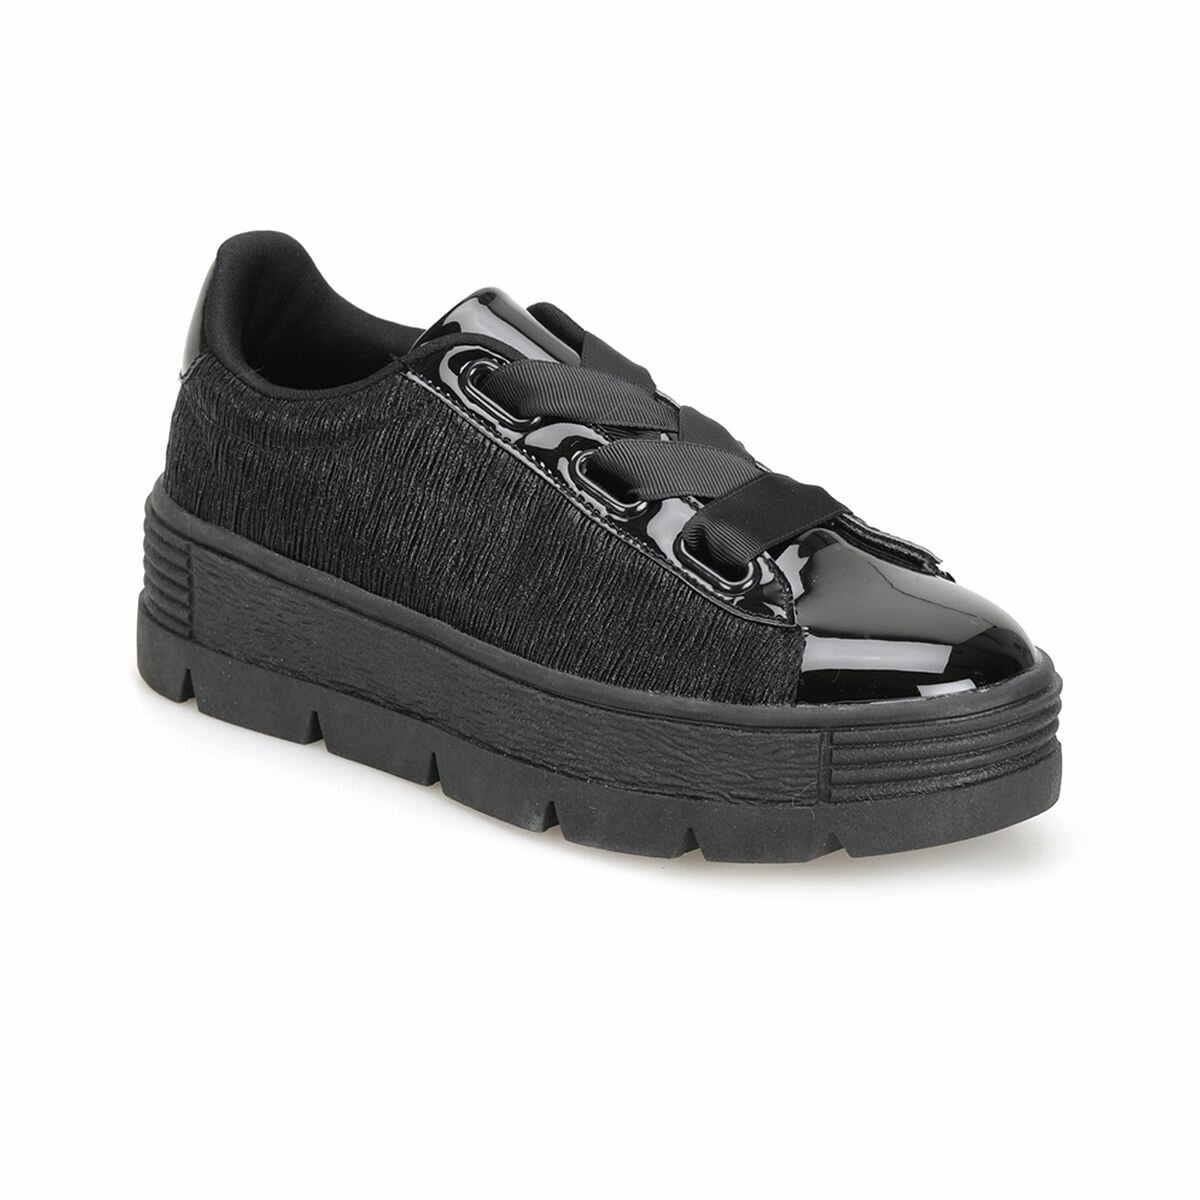 FLO 18K-336 Black Women 'S Sneaker Shoes BUTIGO